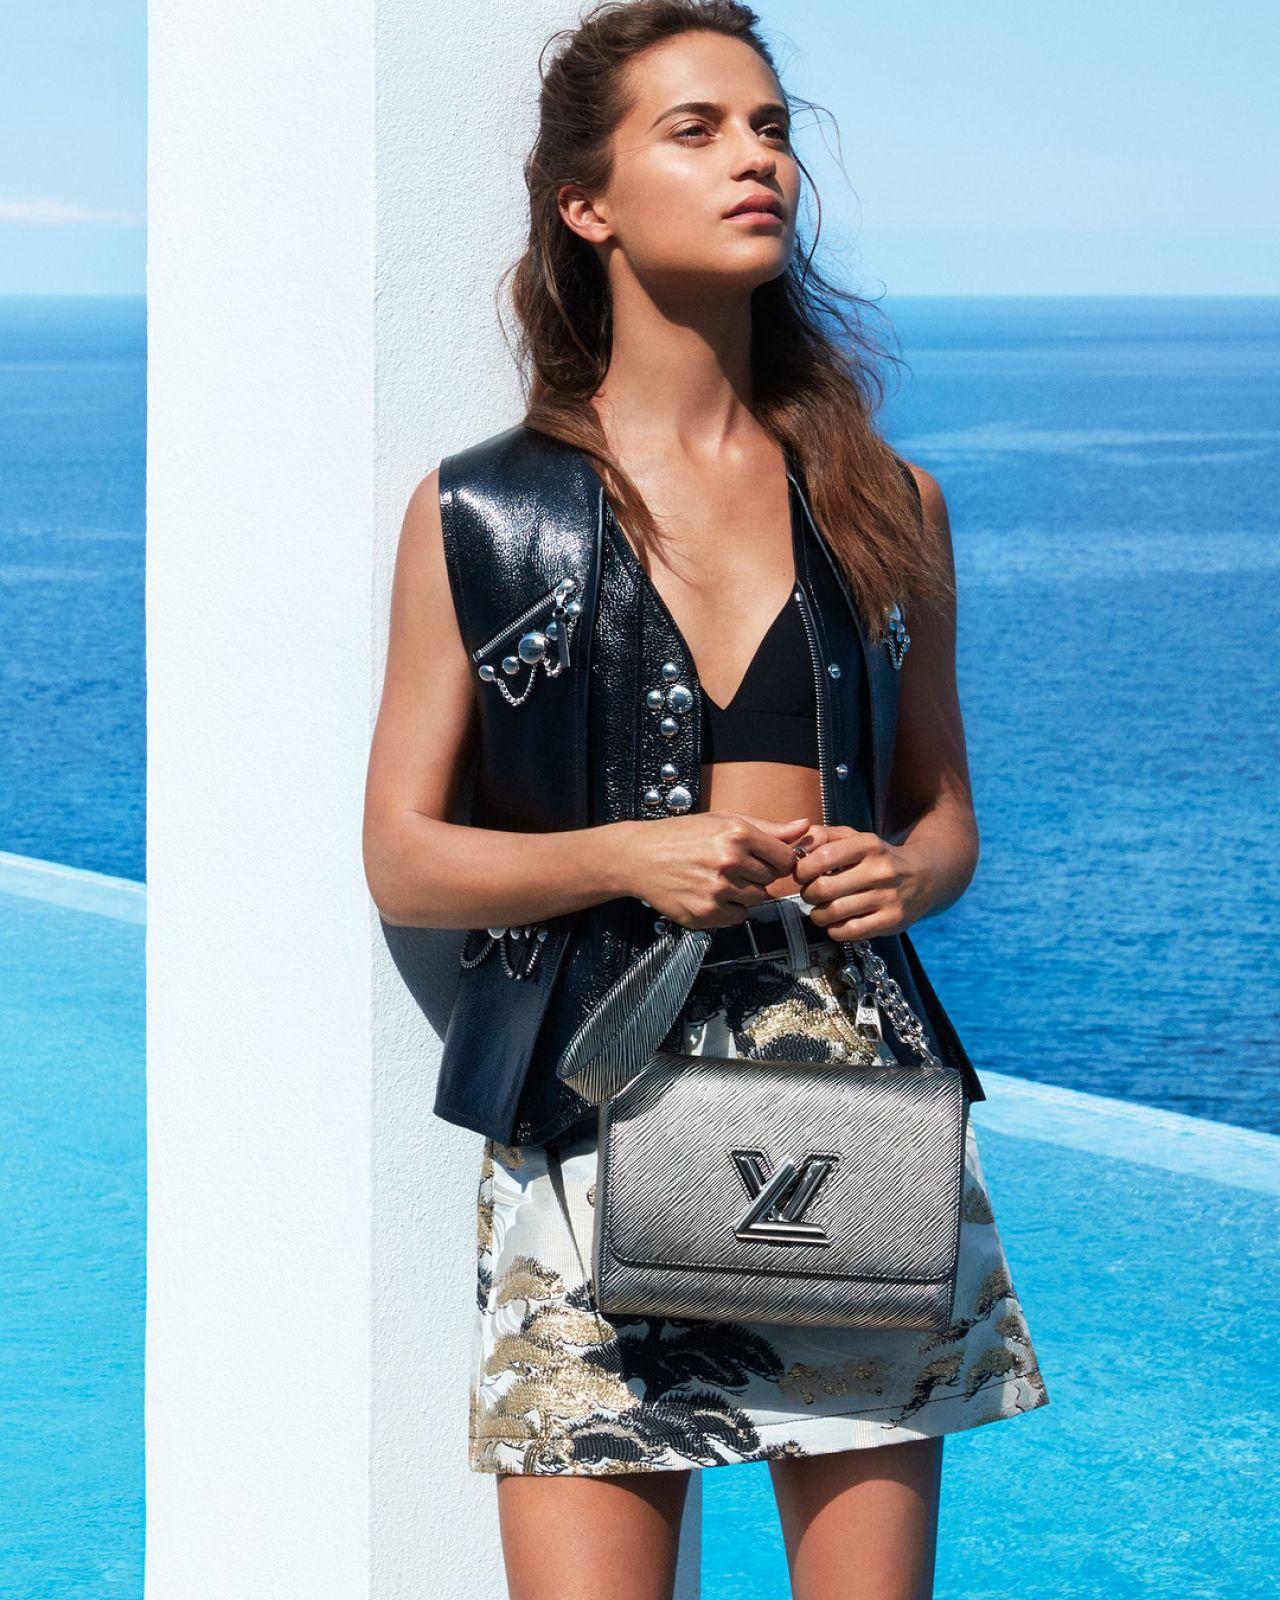 Alicia Vikander Louis Vuitton S Quot The Spirit Of Travel